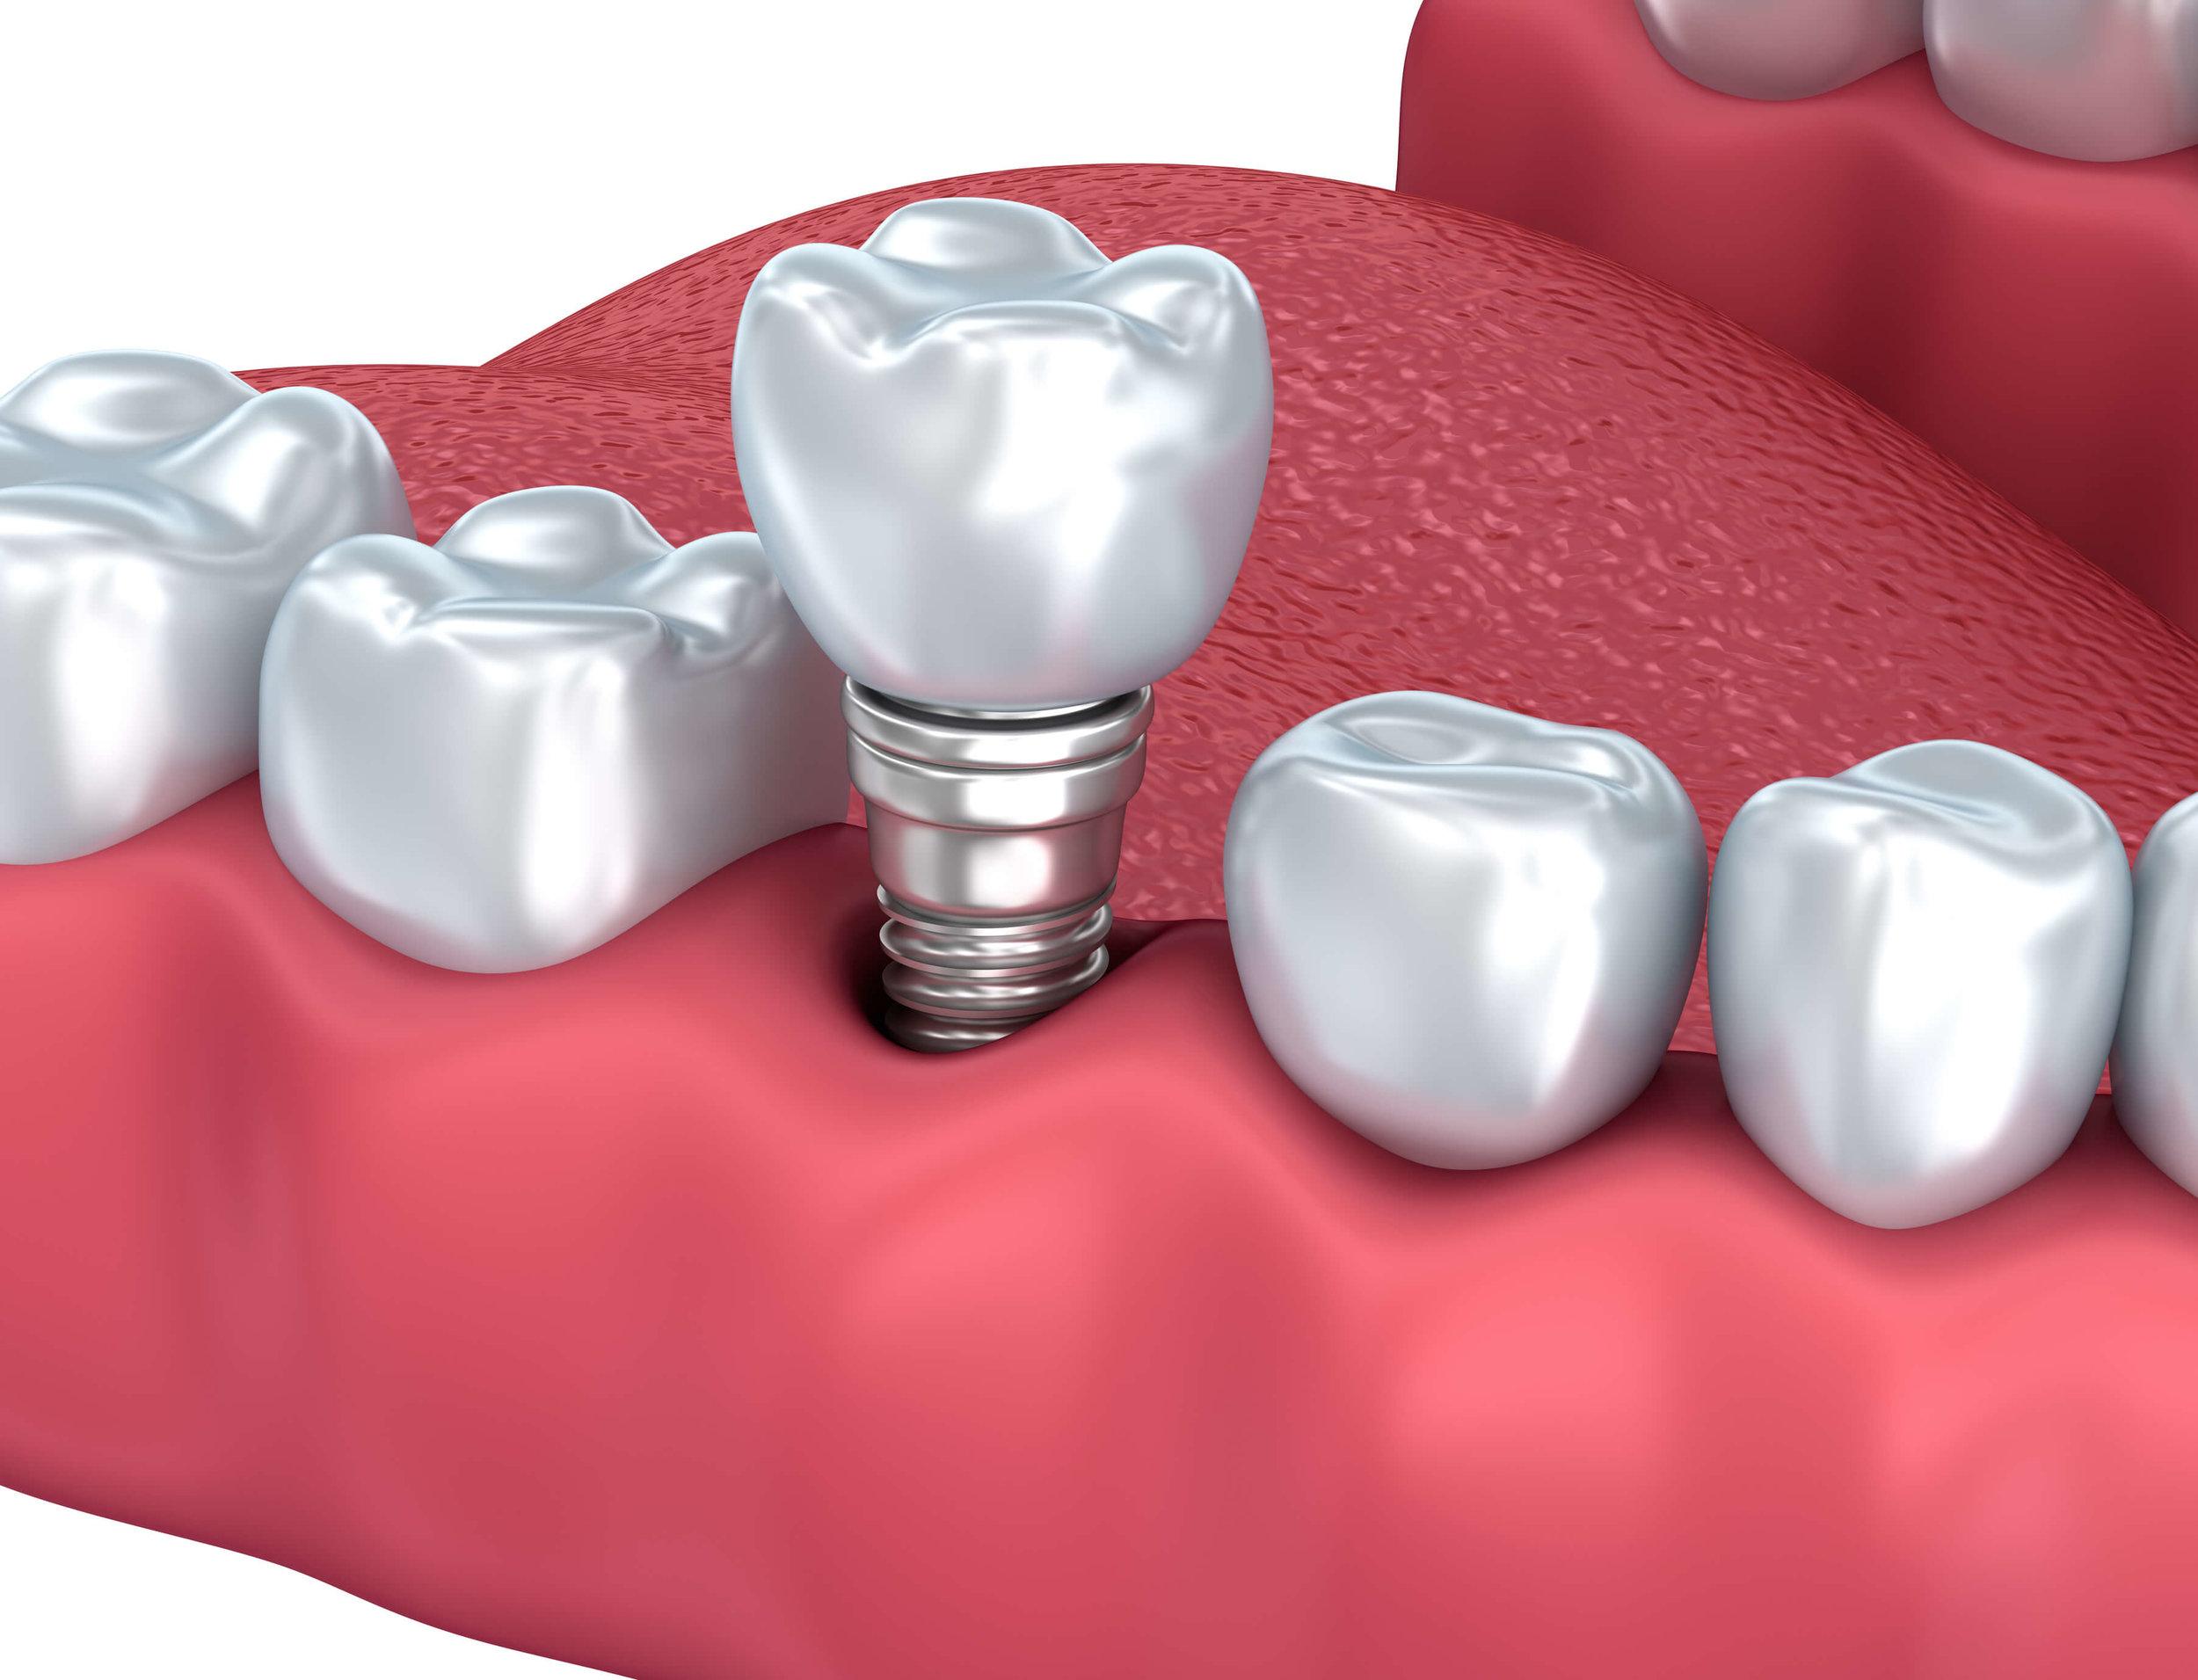 Dental Implant teeth replacement crowns San Diego